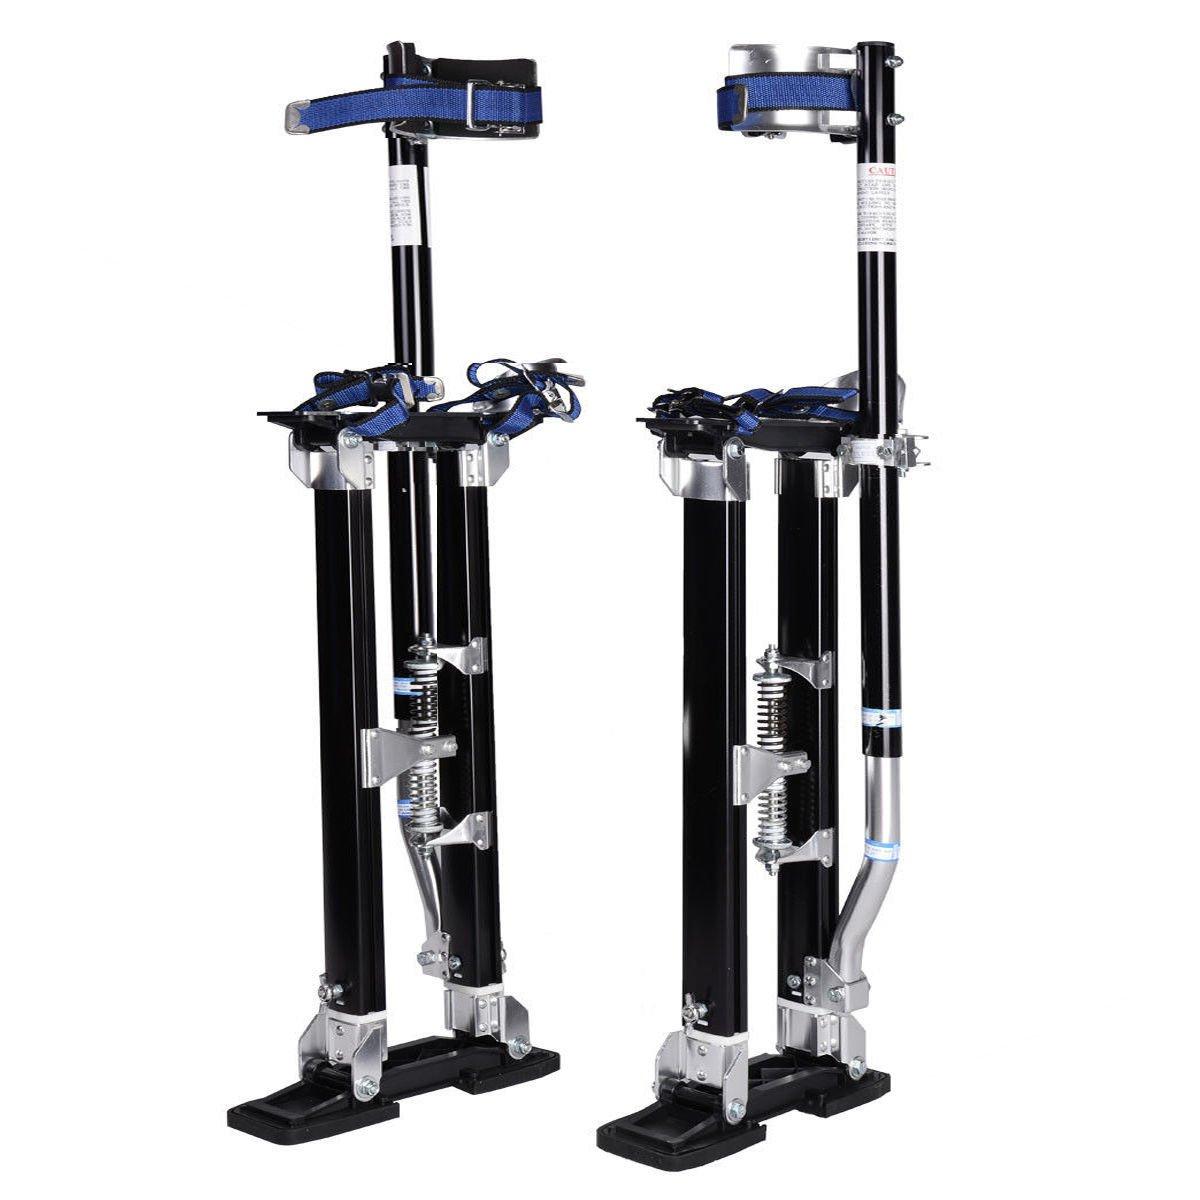 18-30, Black Goplus Drywall Stilts Drywall Lifts Aluminum Tool Stilt for Painting Painter Taping